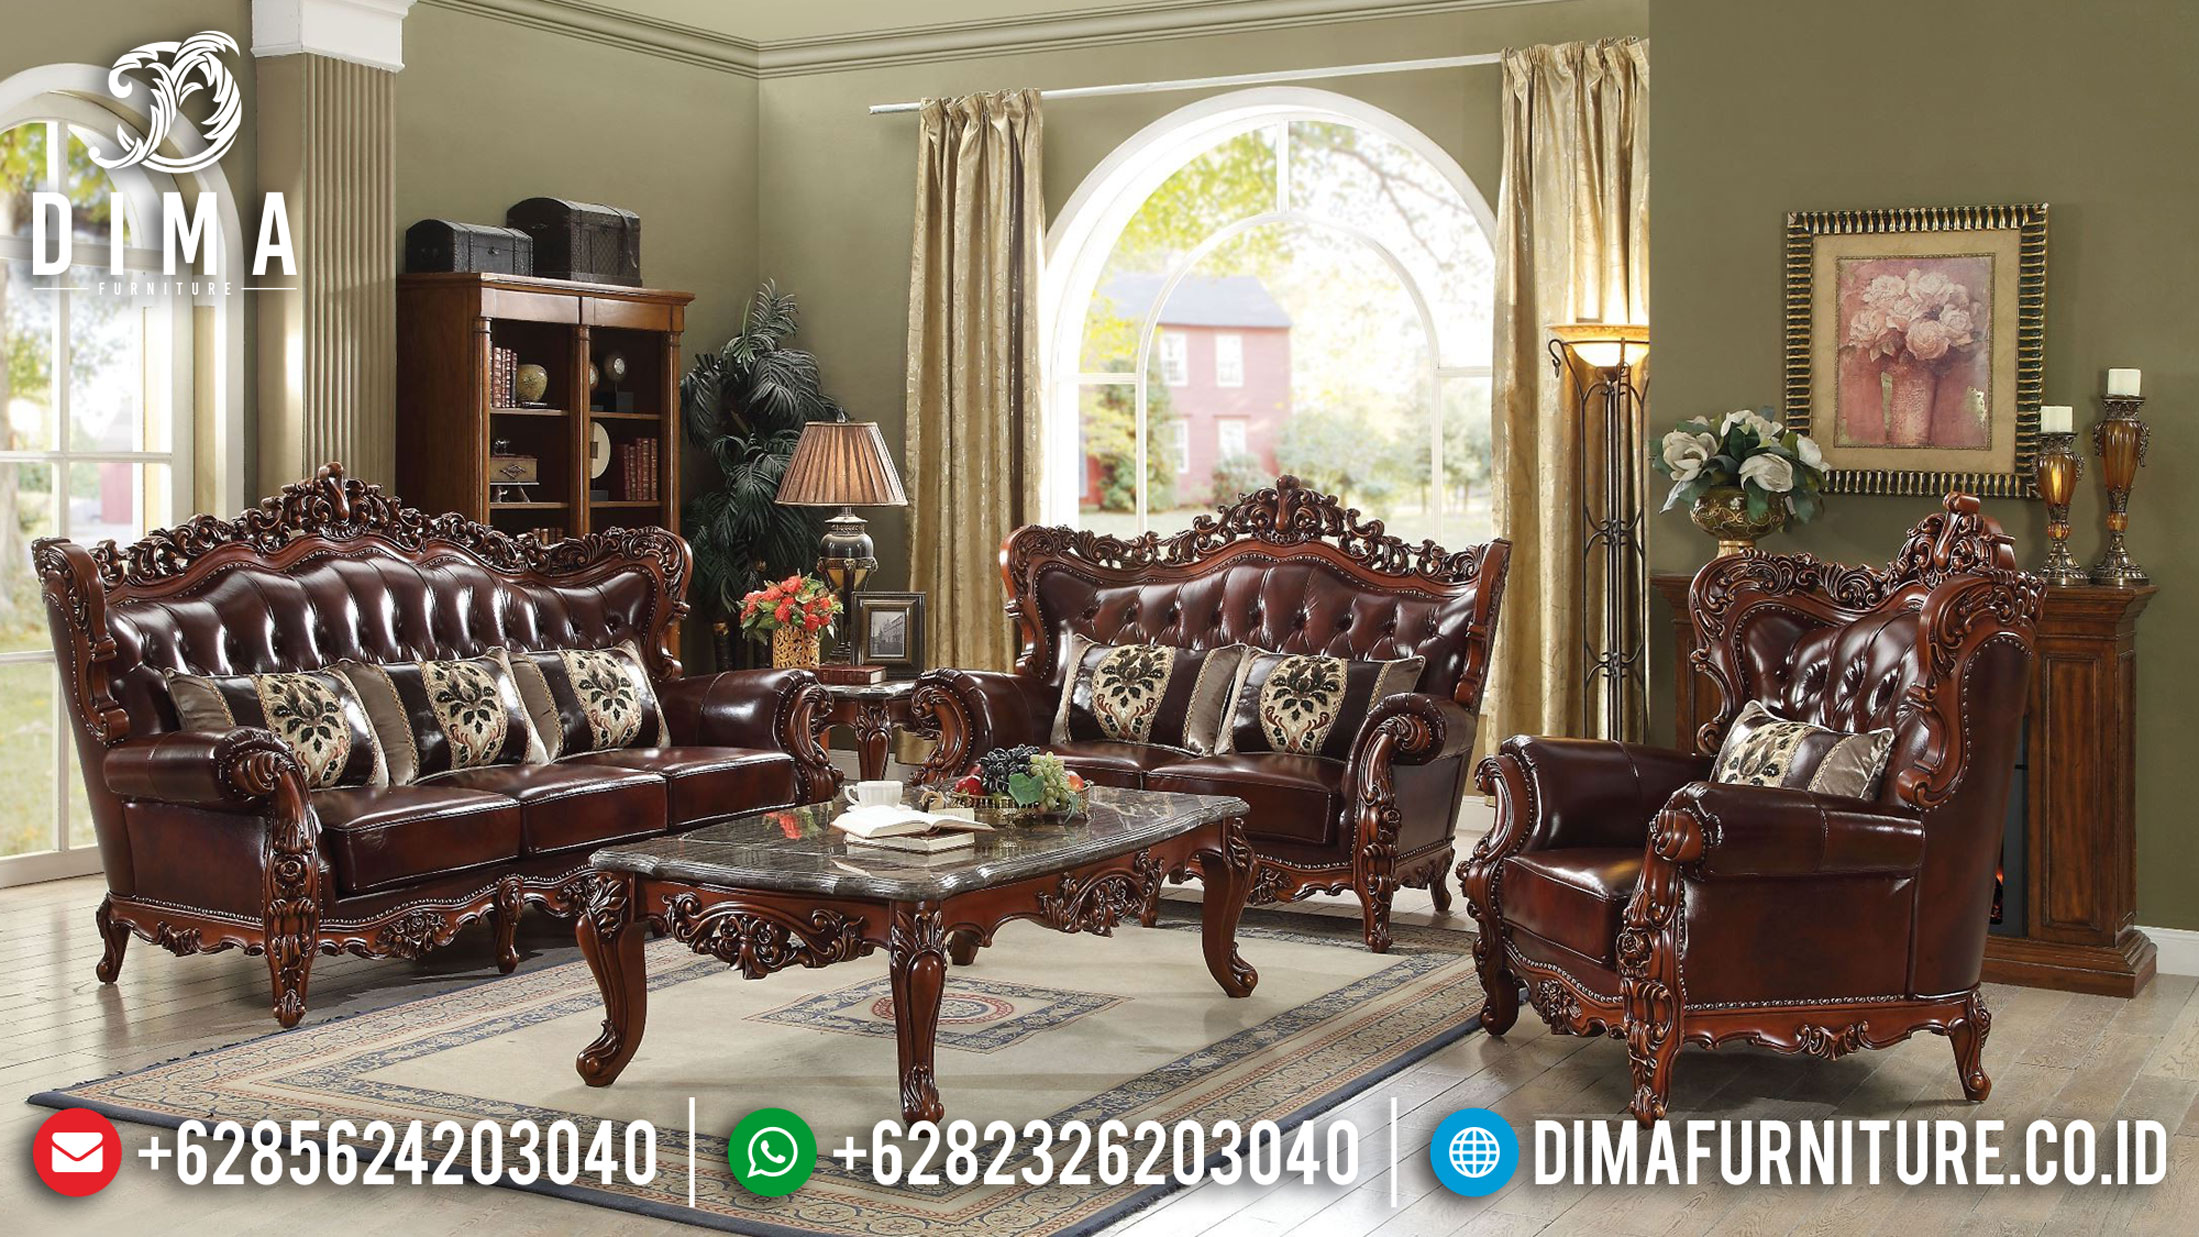 Harga Sofa Mewah Ukiran Jepara Luxury Classic Natural Jati Perhutani TTJ-1058